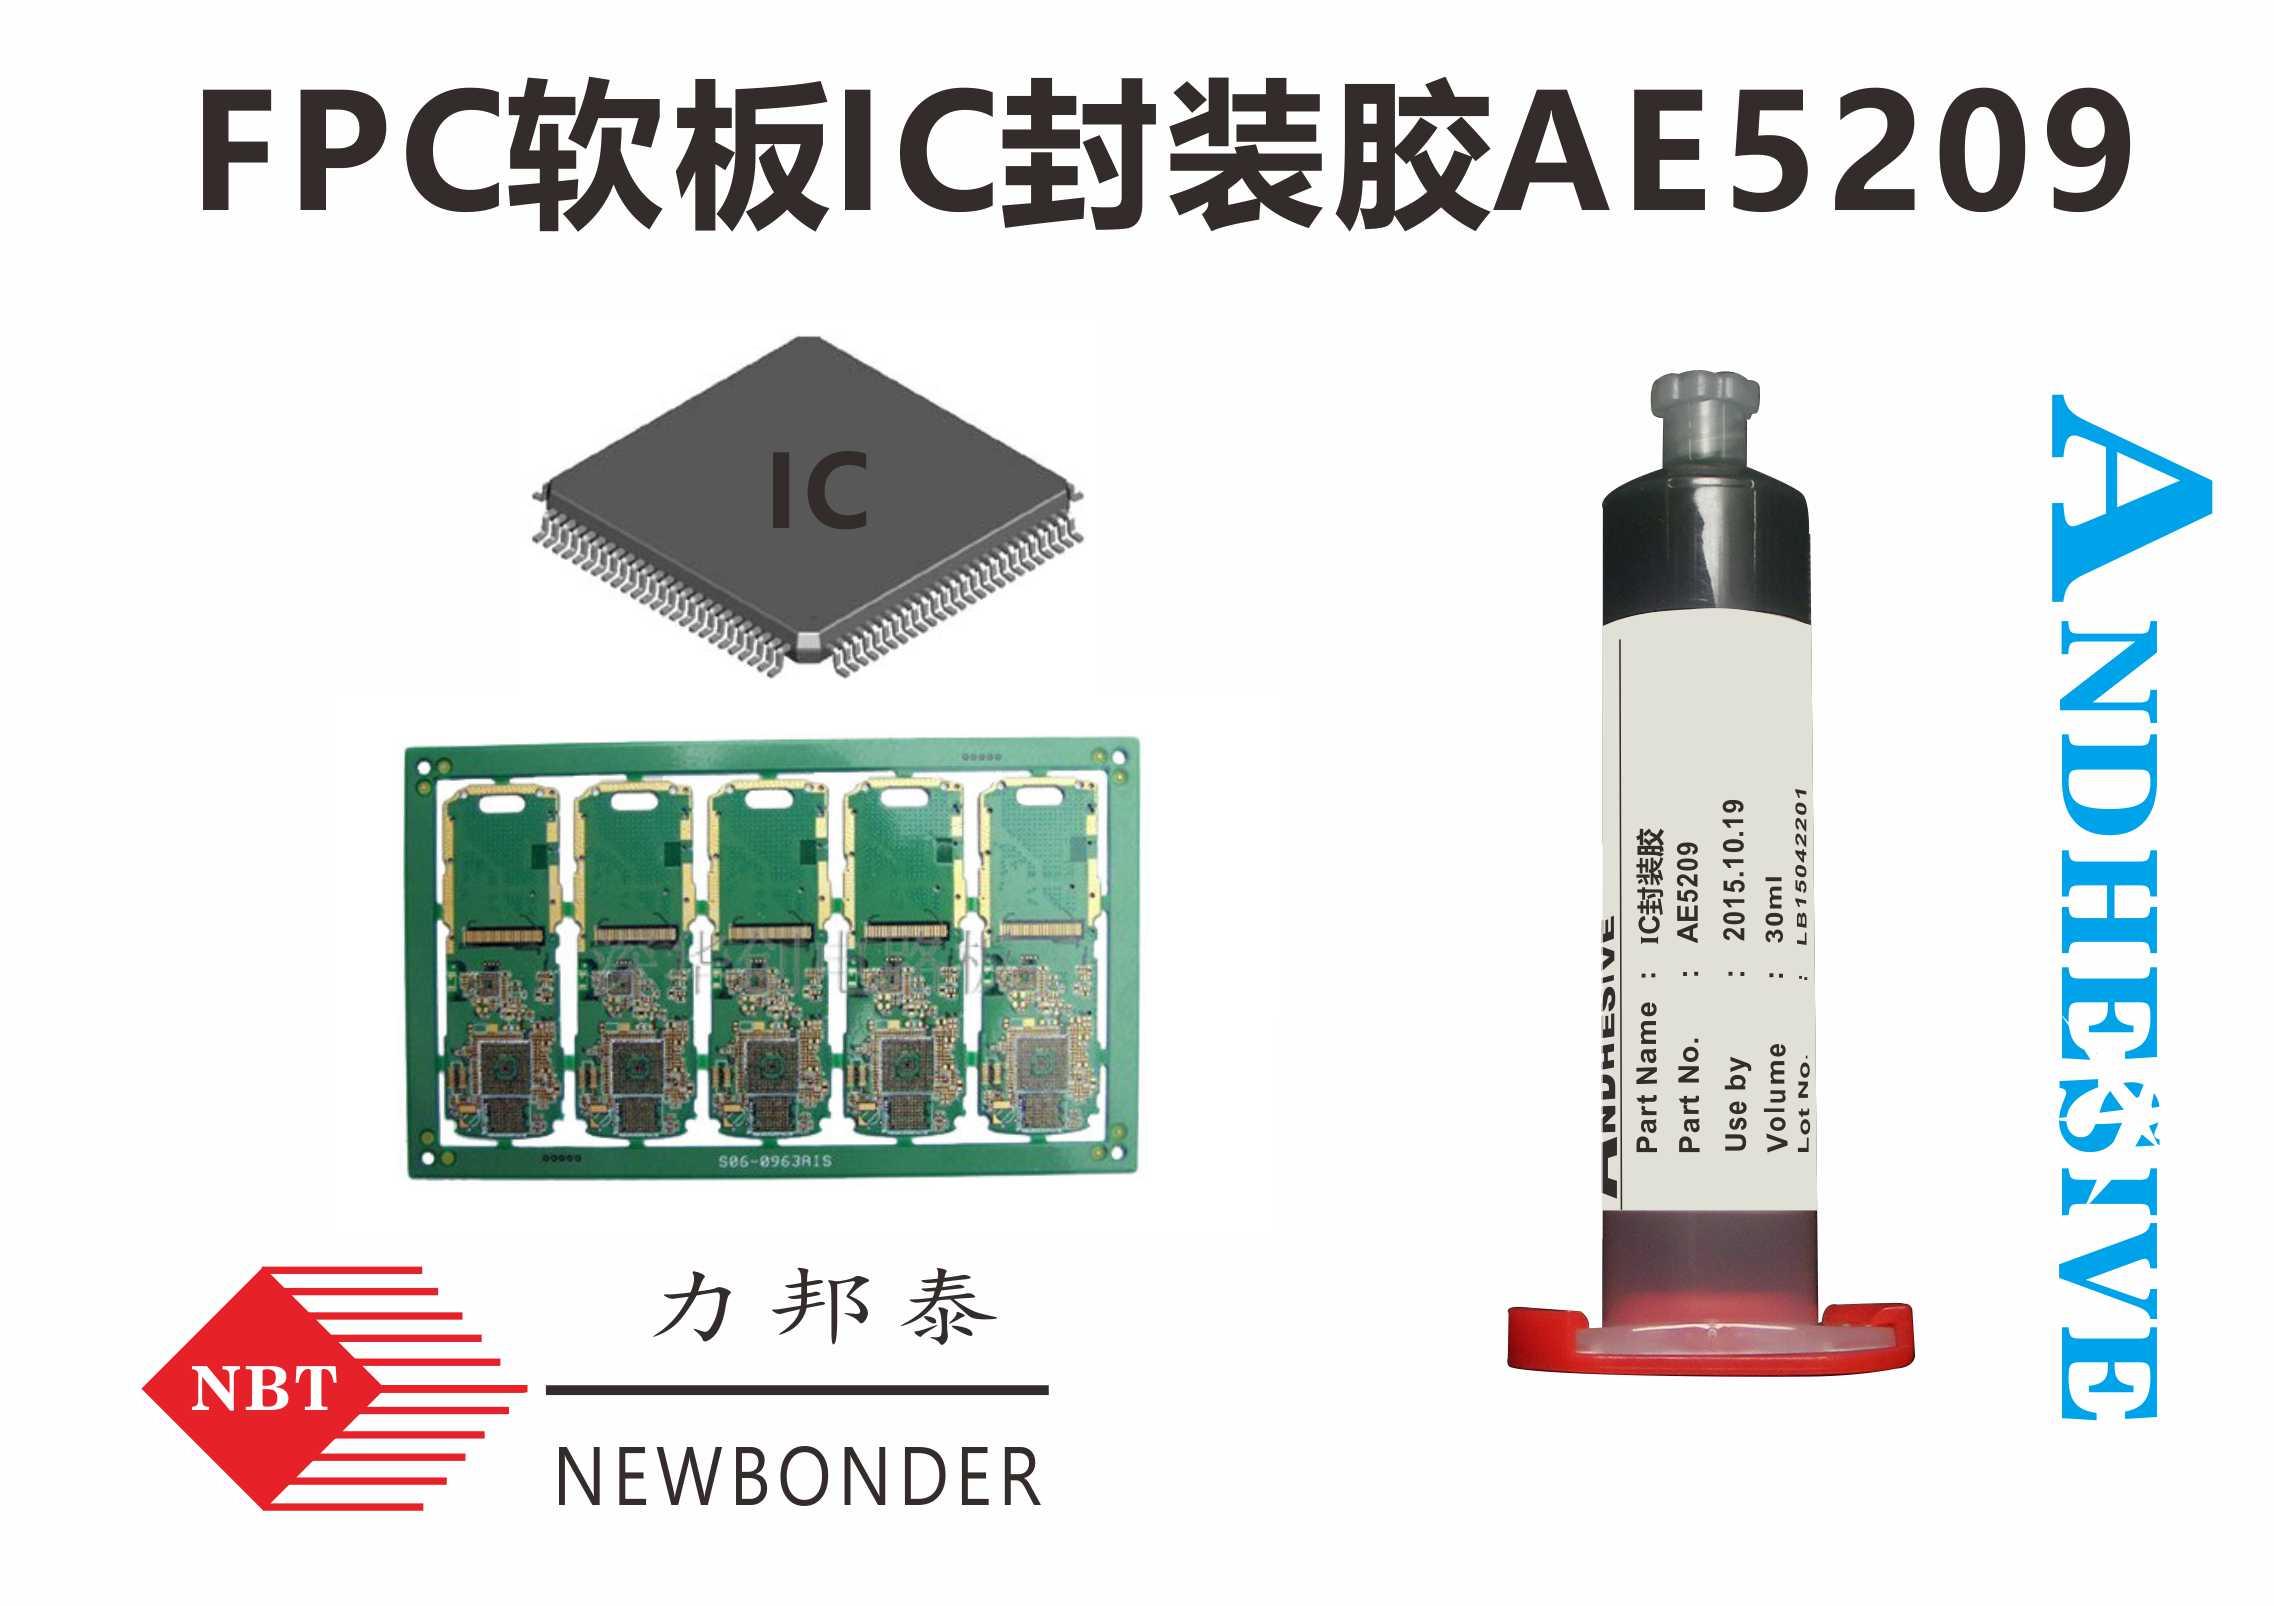 FPC软板胶粘剂AE5209